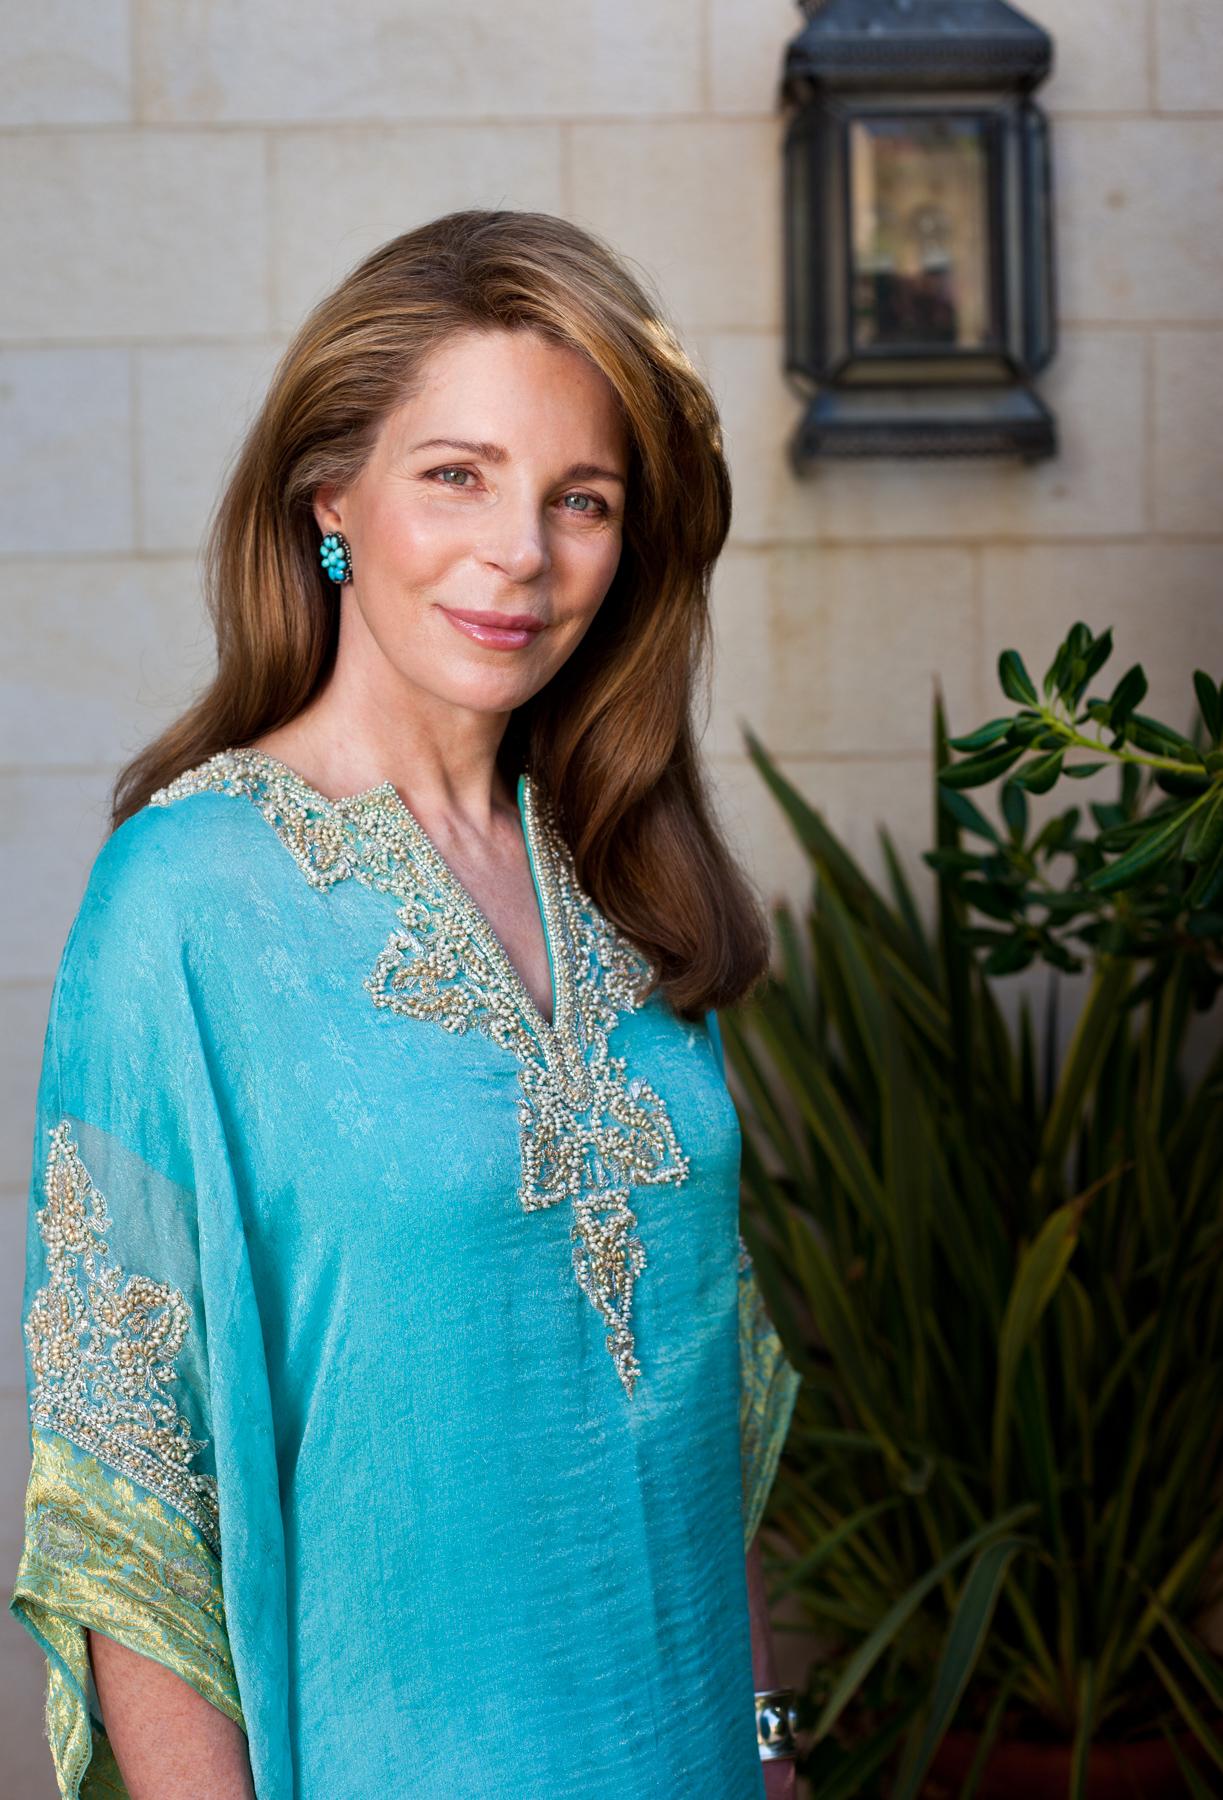 Her Majesty Queen Noor of Jordan, photographed for JO Magazine on July 21, 2011.